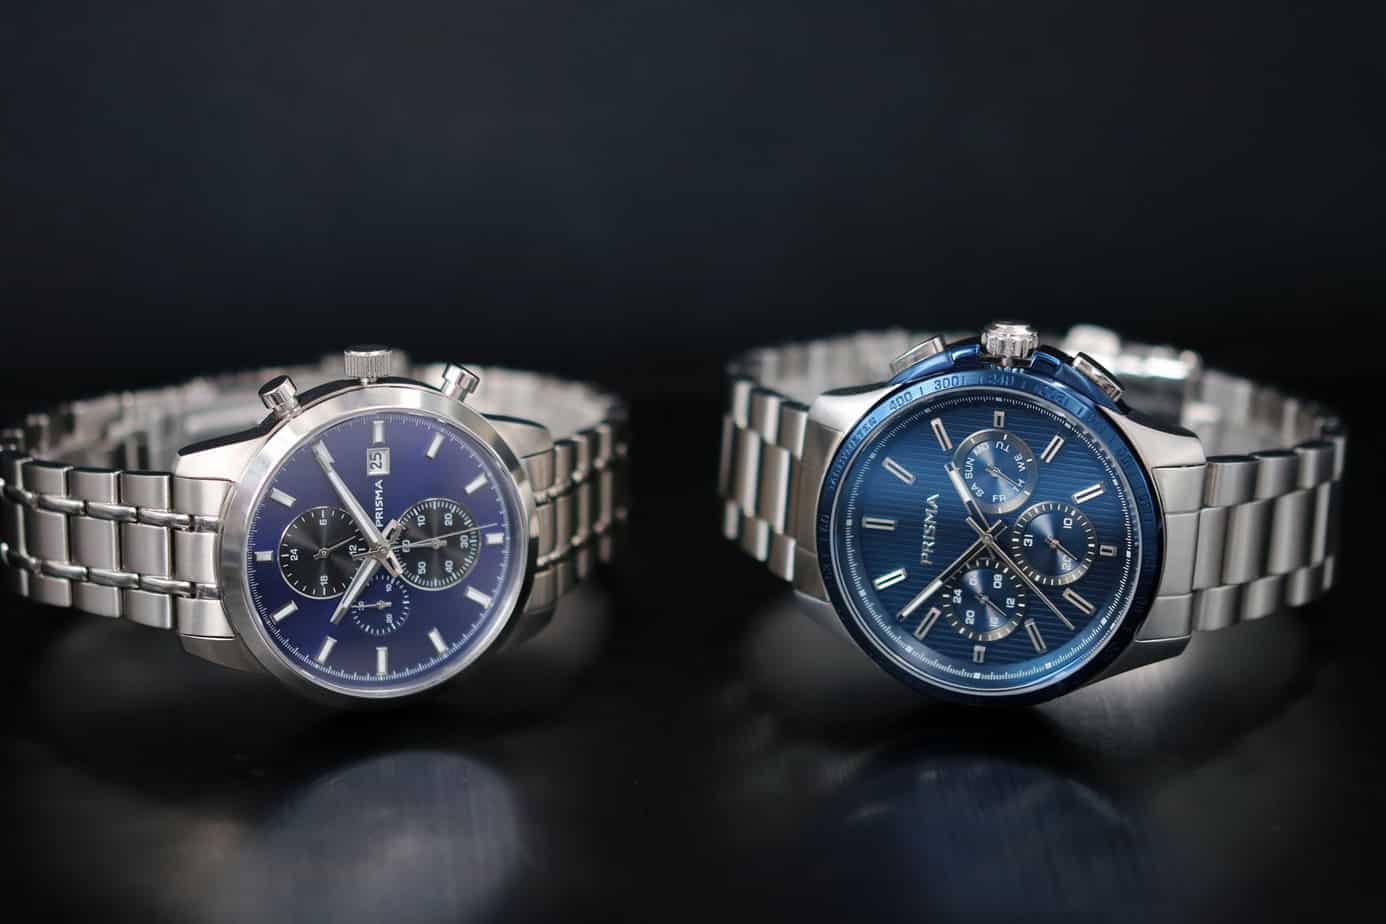 blauwe horloges blauw wijzerplaten blue dials watches